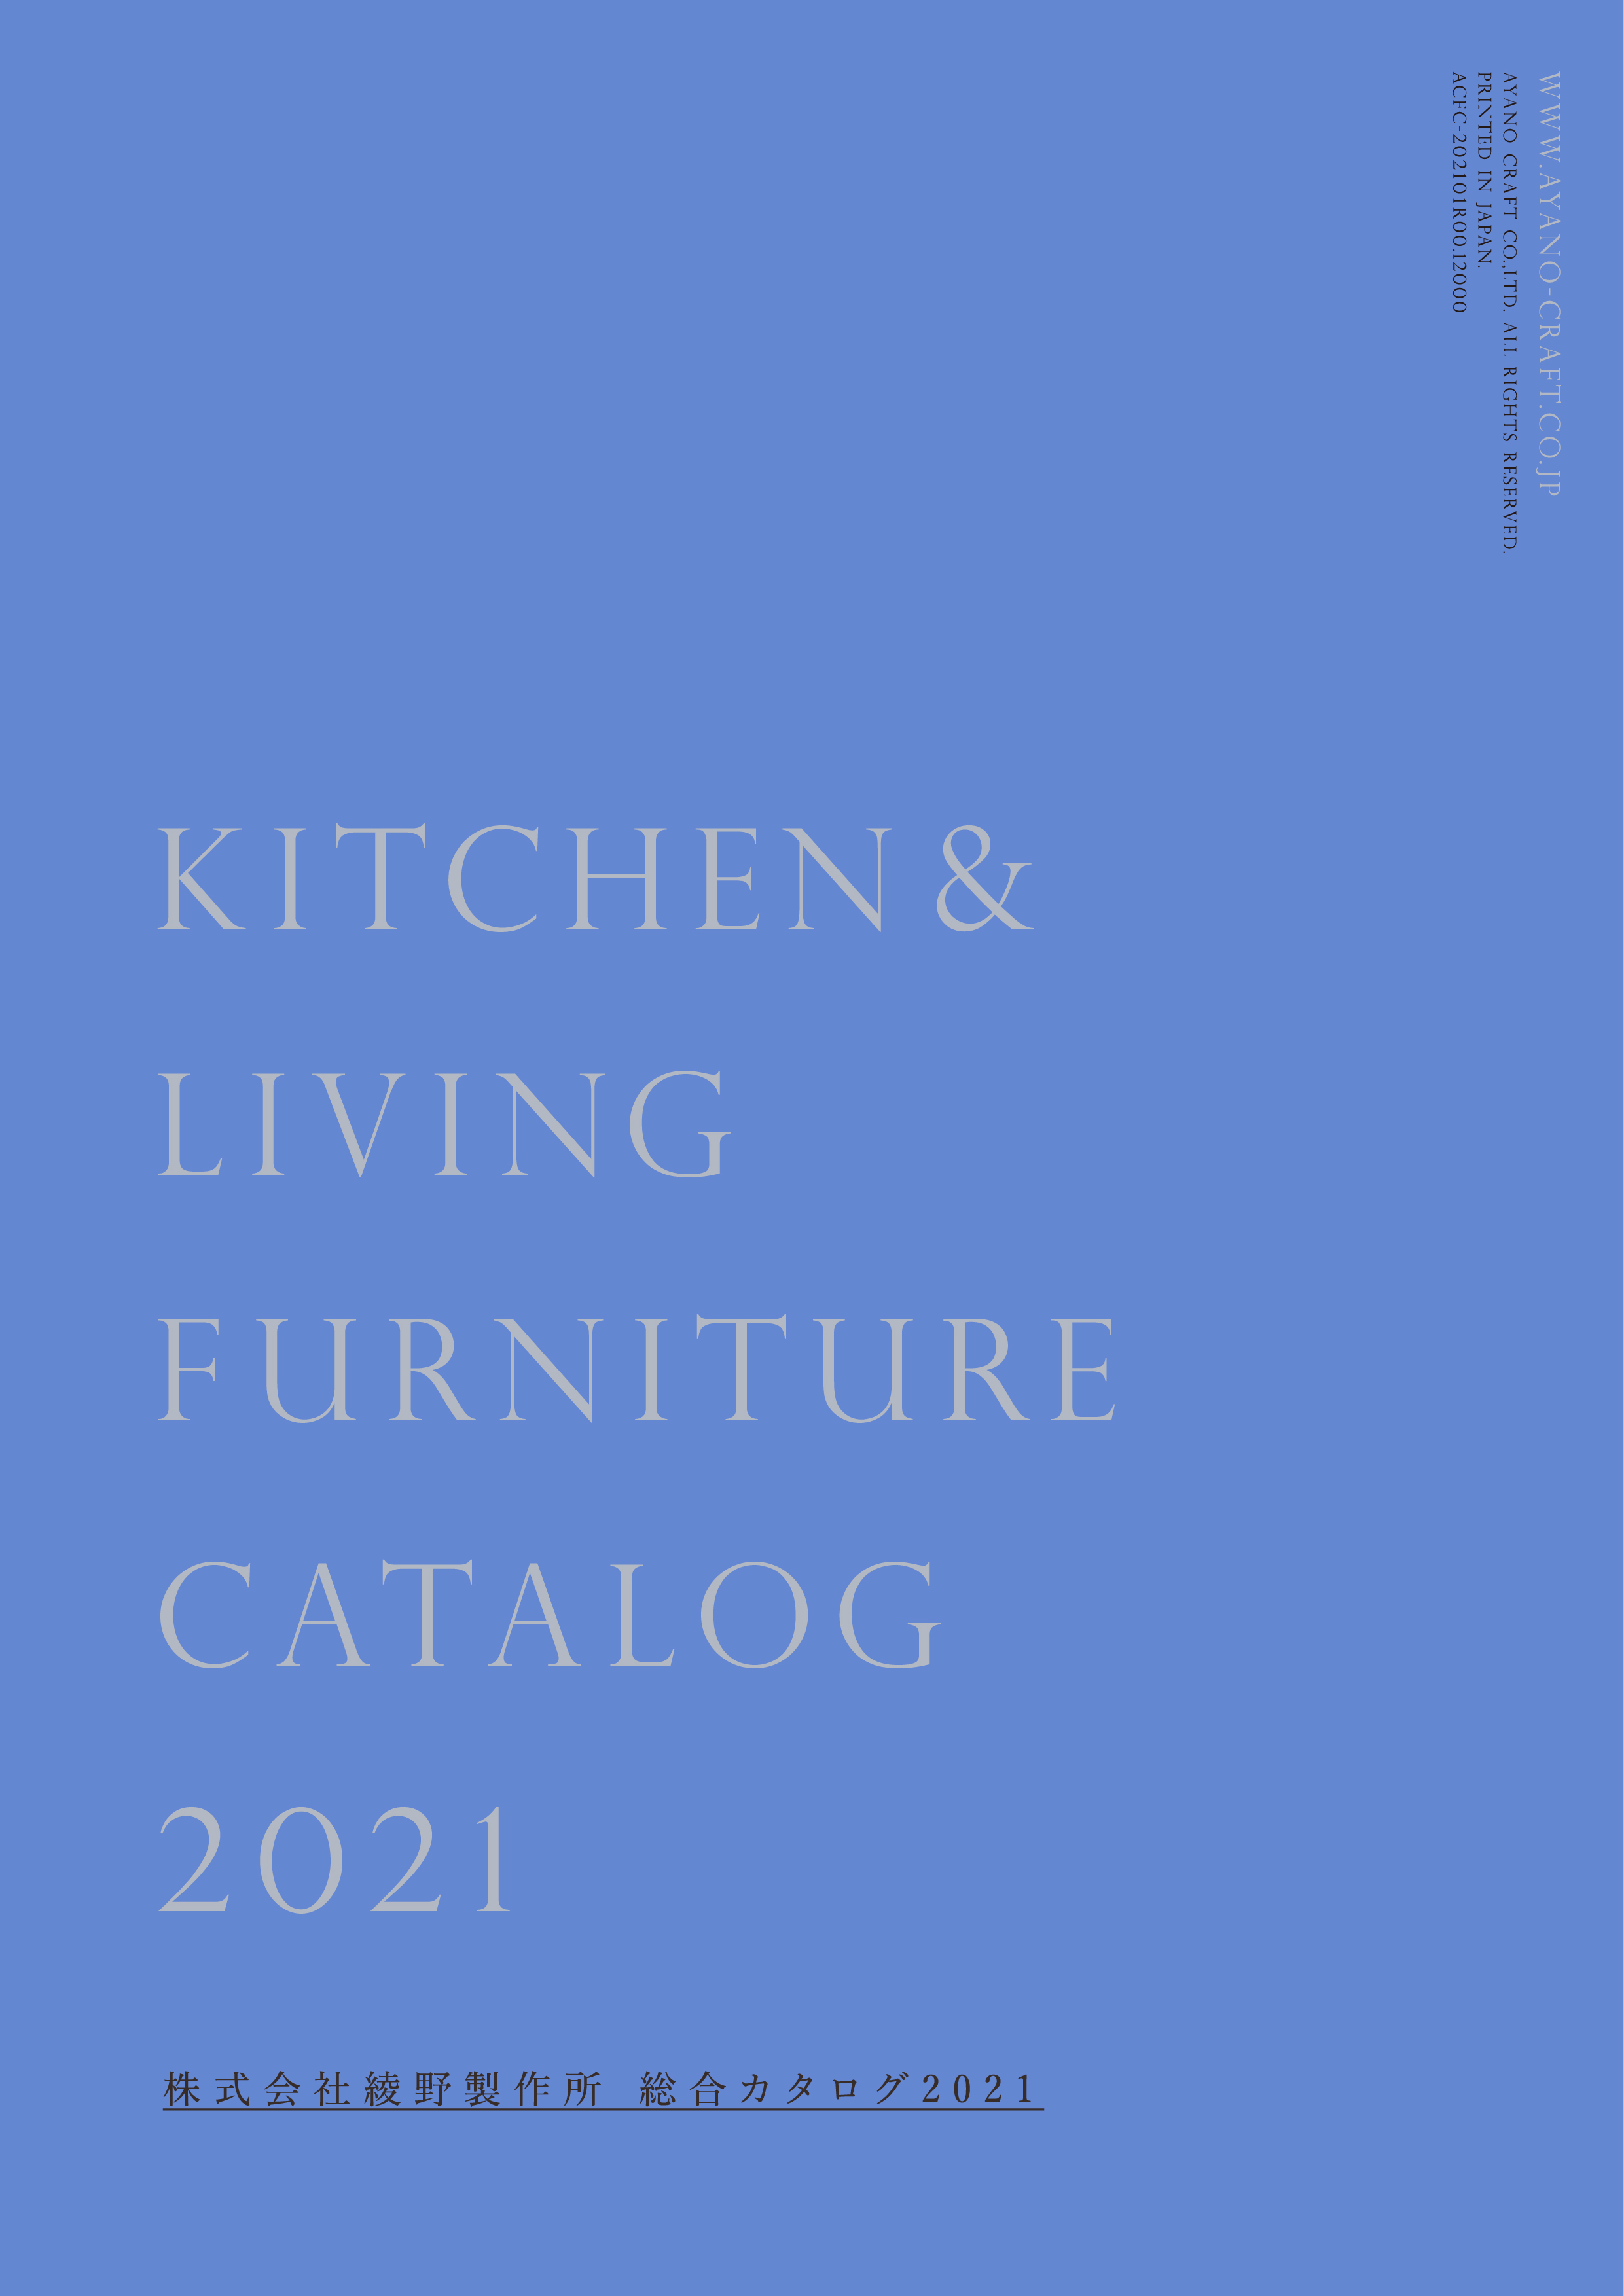 catalog2021_icon